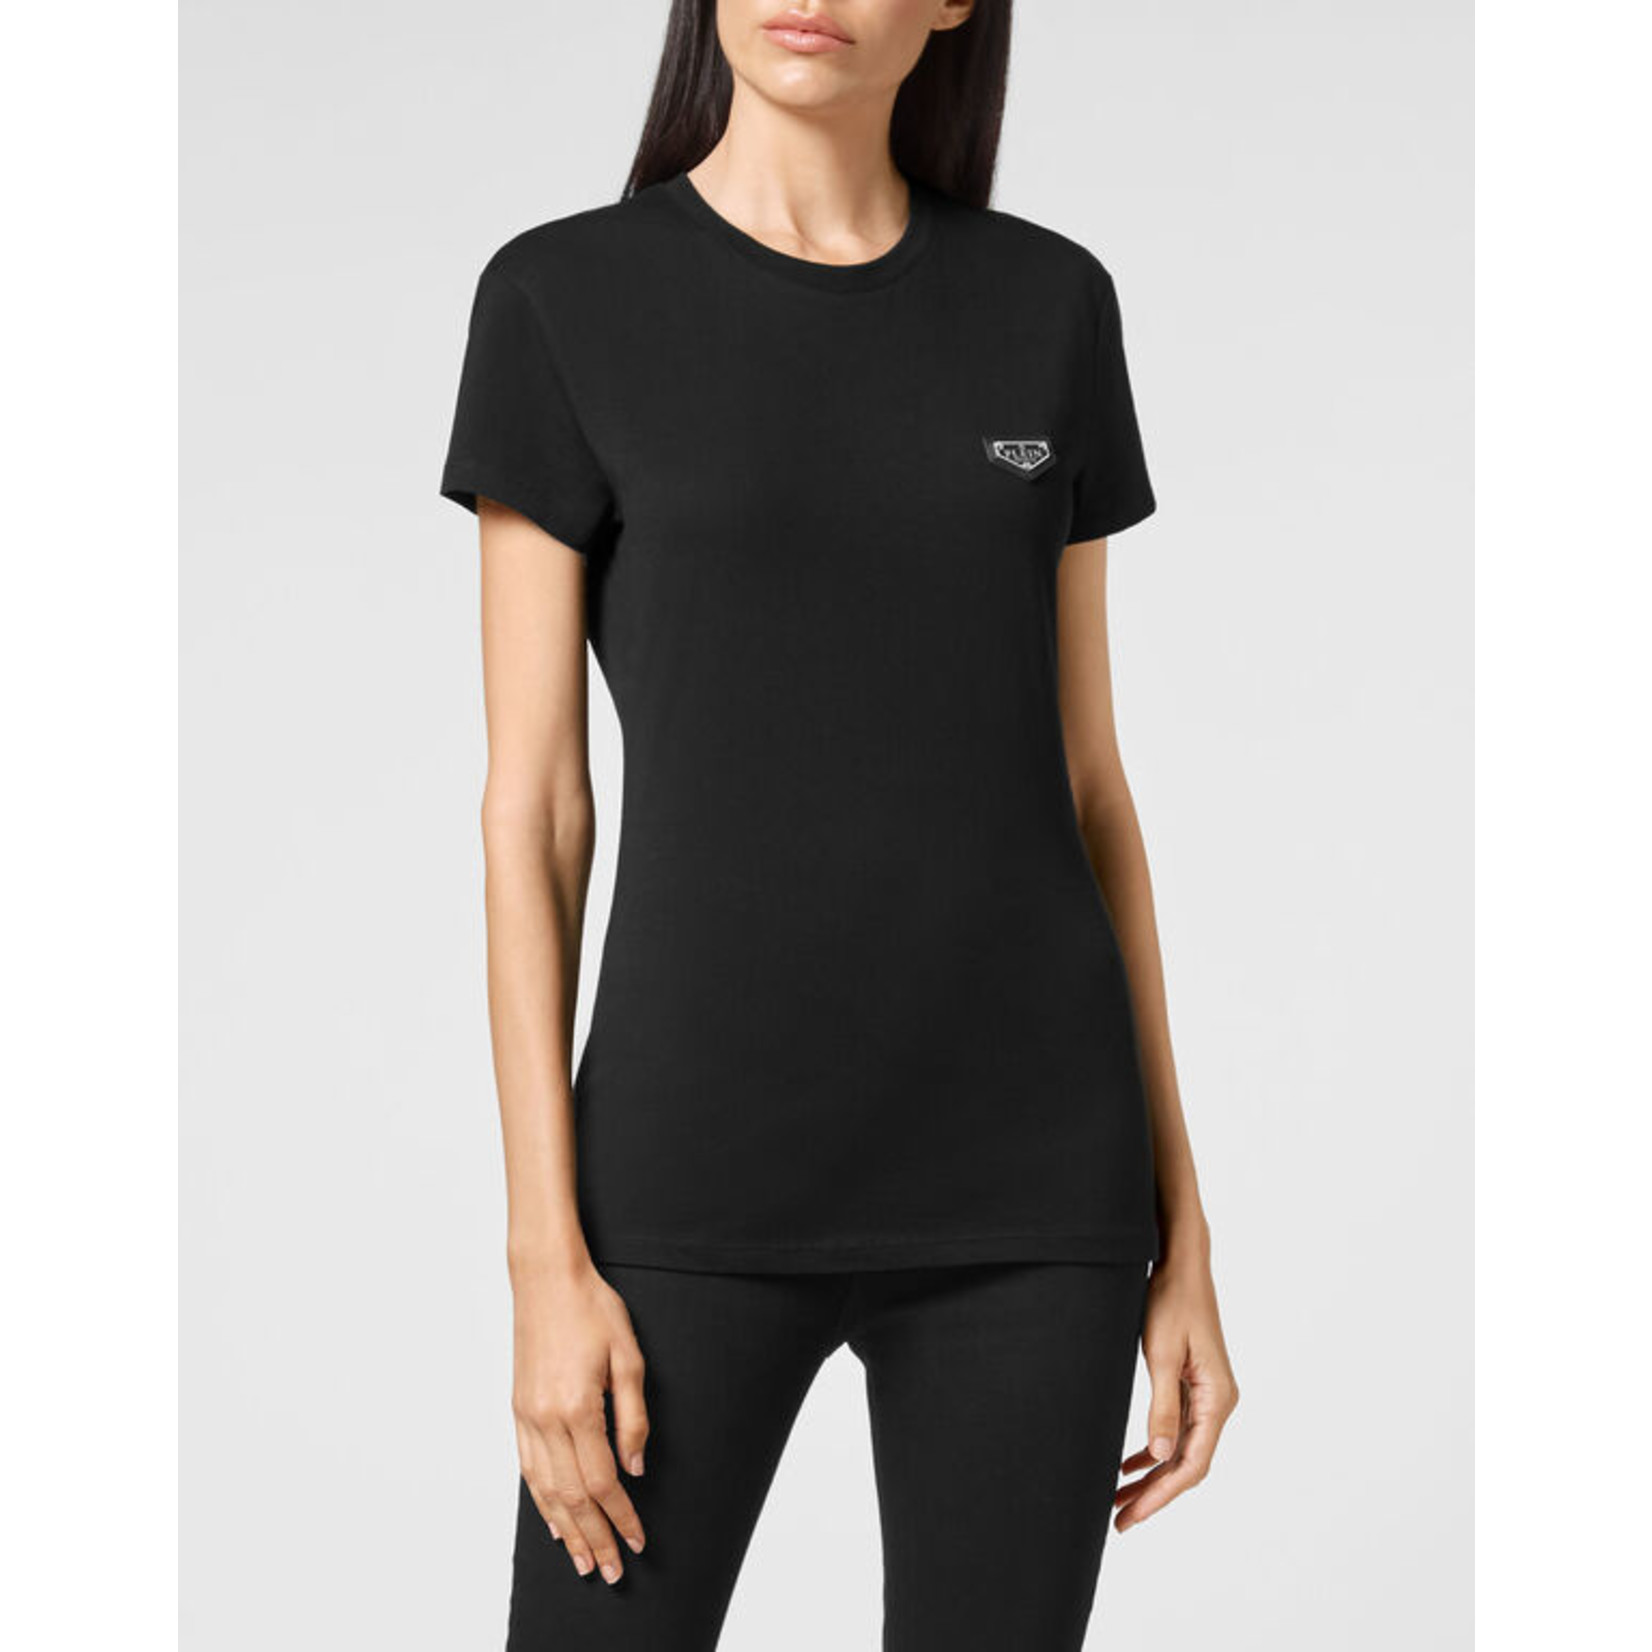 Philipp Plein T-Shirt 42897